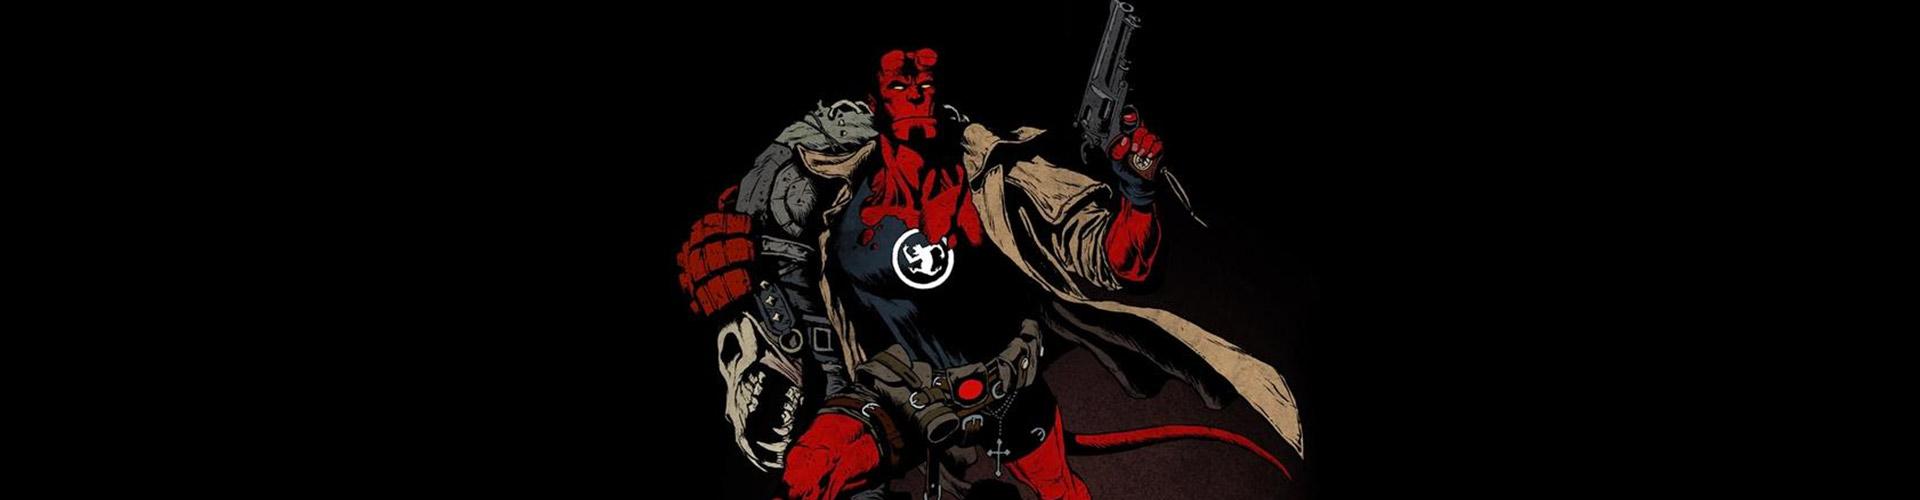 hellboy-header.jpg